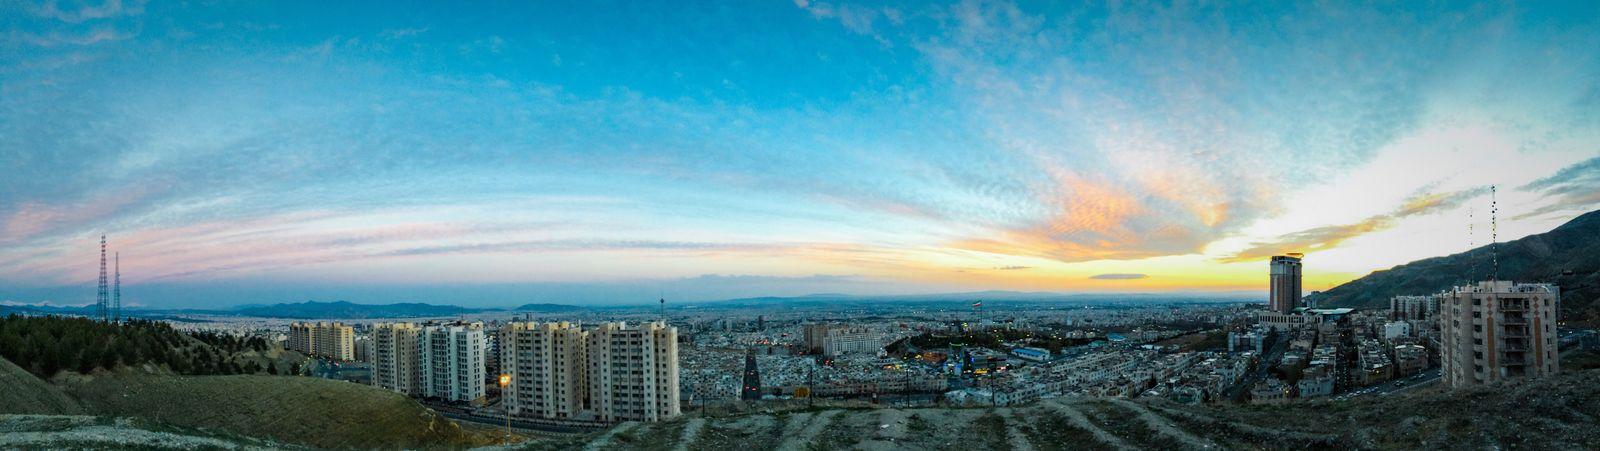 Tehran, Iran Panoramic Kuyefaraz Sunset Cityscape City Wide Sky Cloud - Sky Tower Dramatic Sky IPhone Photography Iphonepanorama